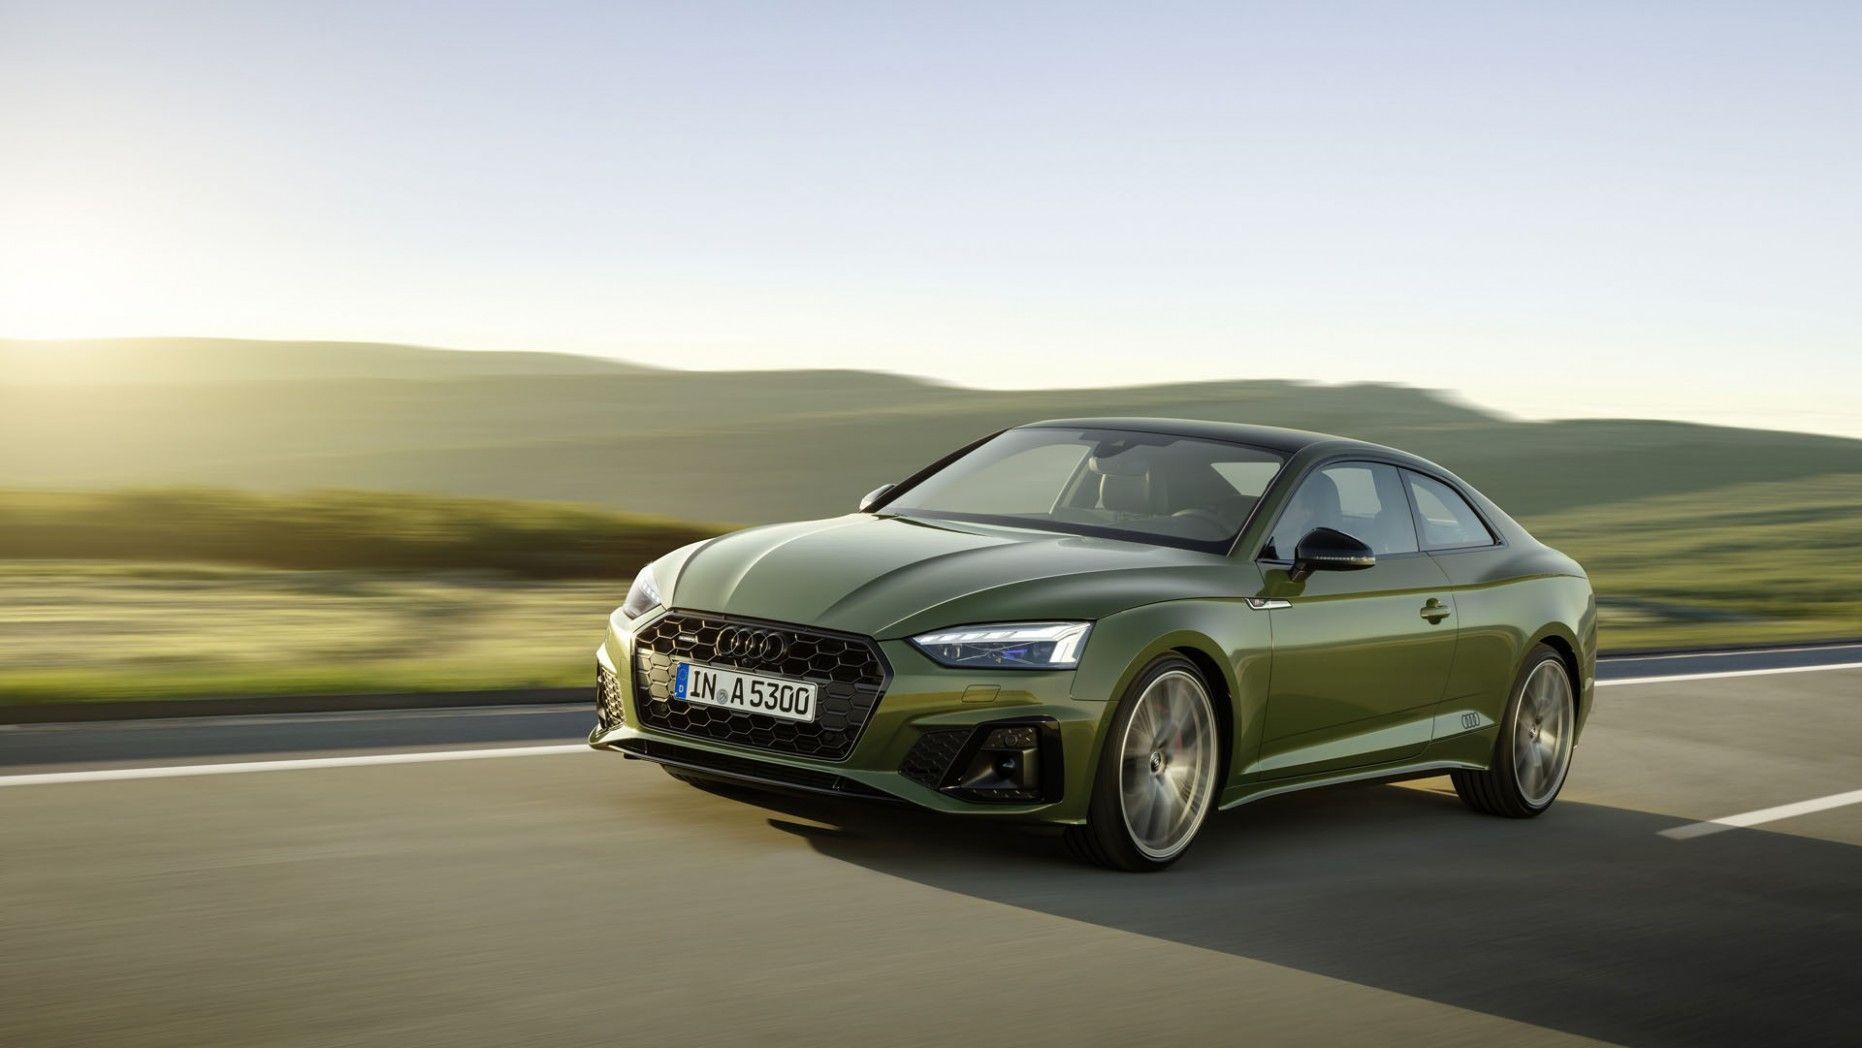 2020 Audi A5 Audi A5 Audi A5 Coupe Audi S5 Sportback